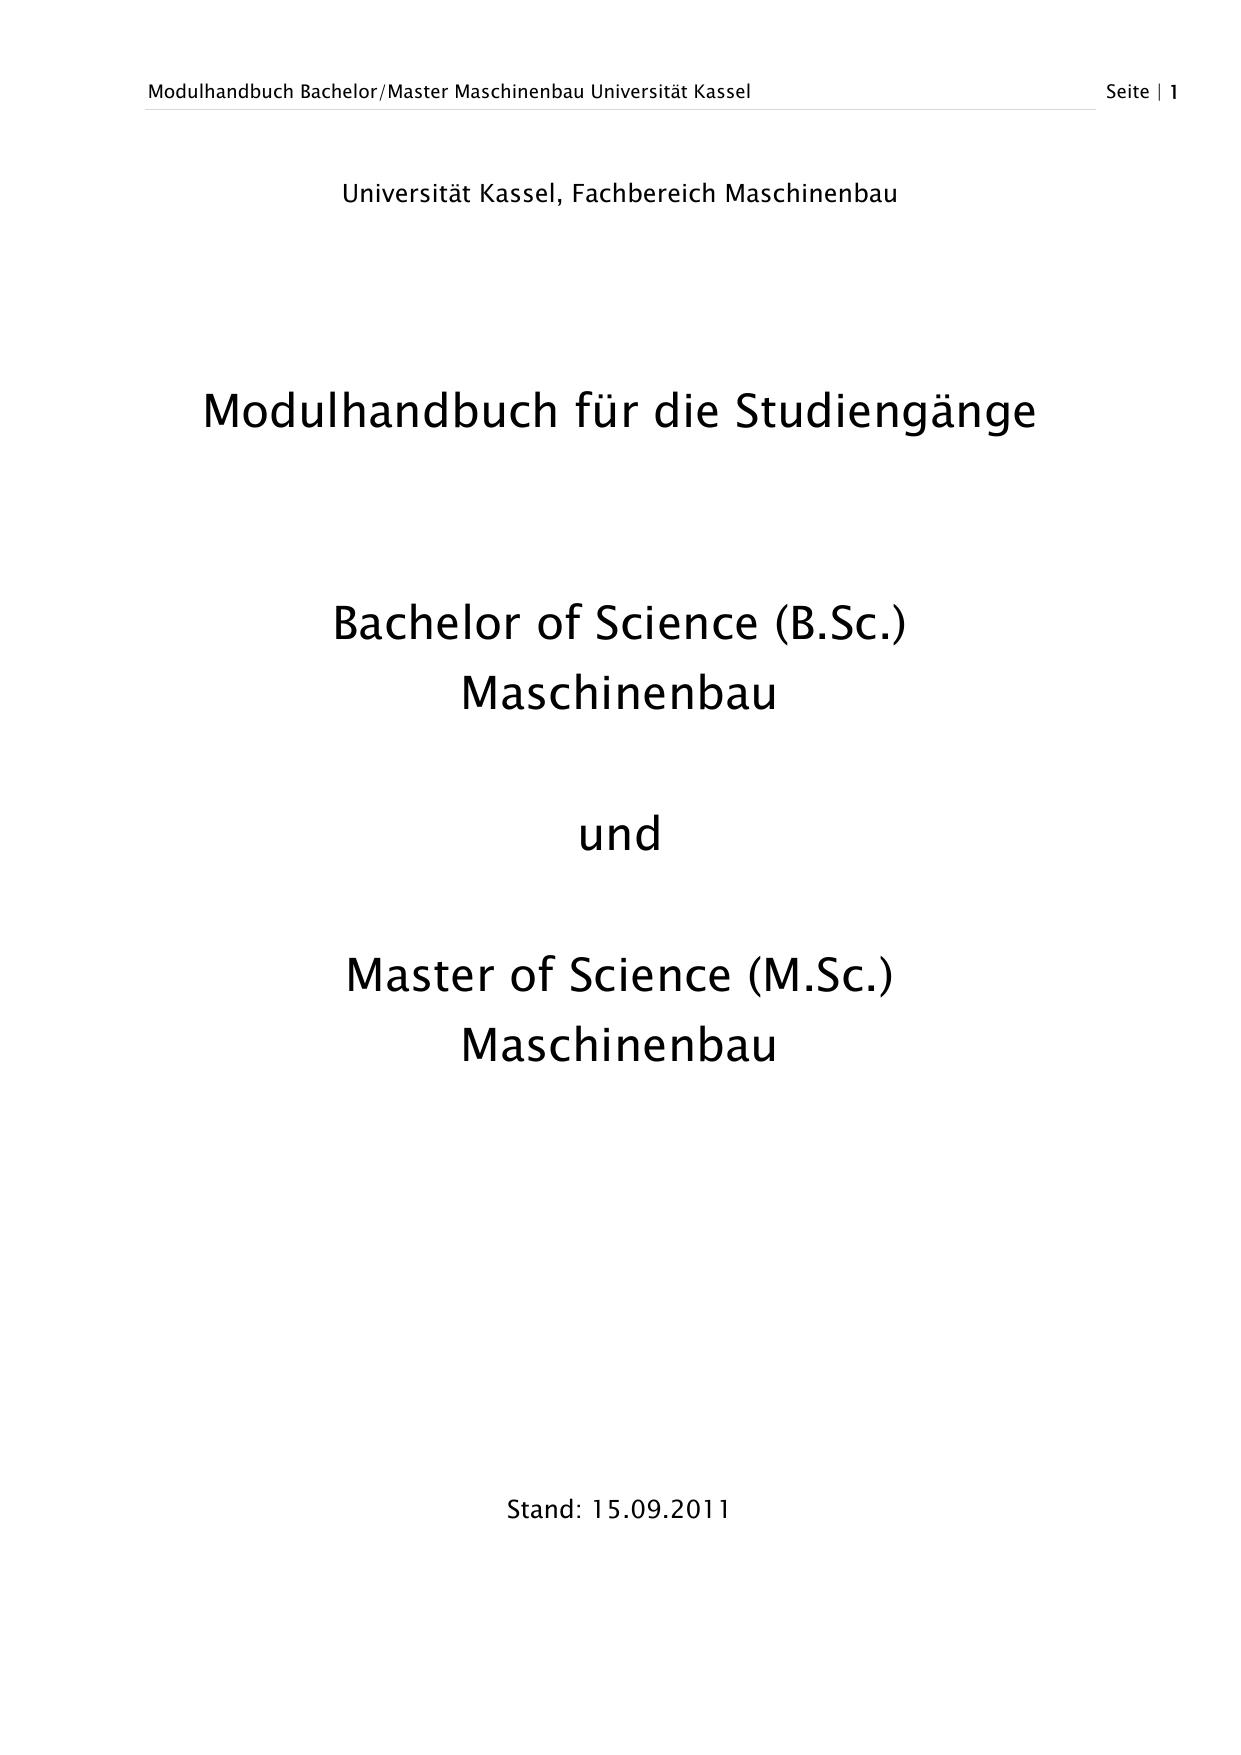 Maschinenbau - Universität Kassel | manualzz.com